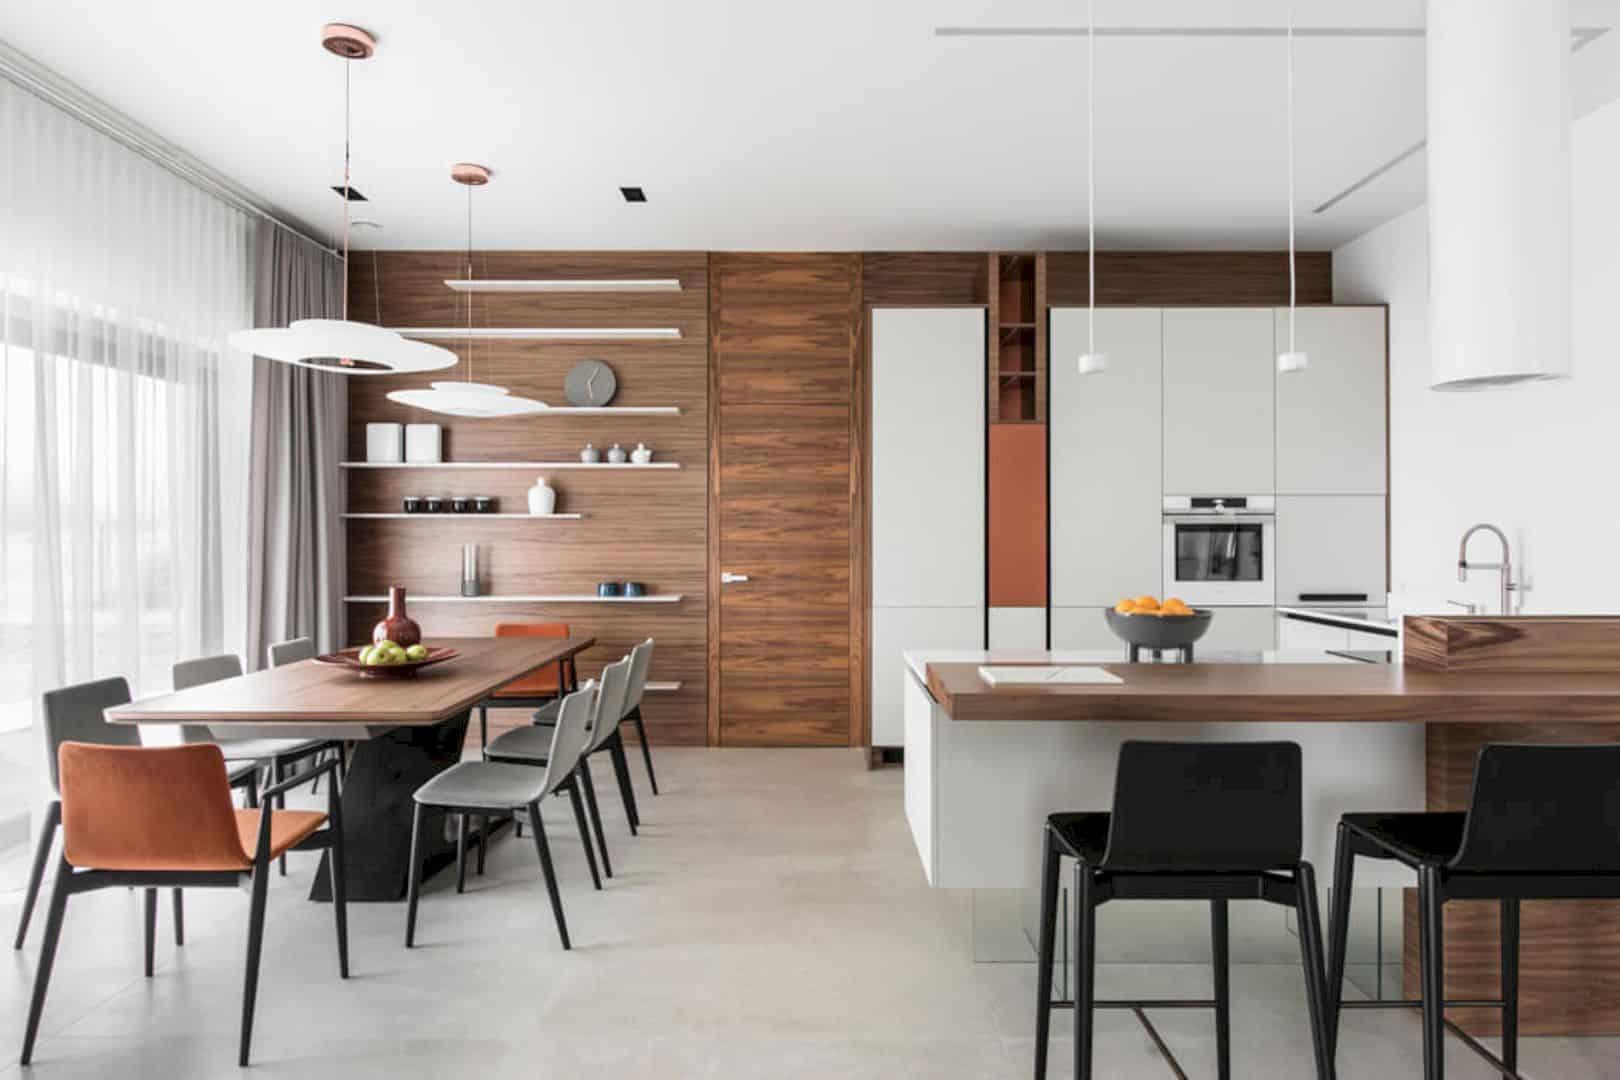 House With Orange Taste 5